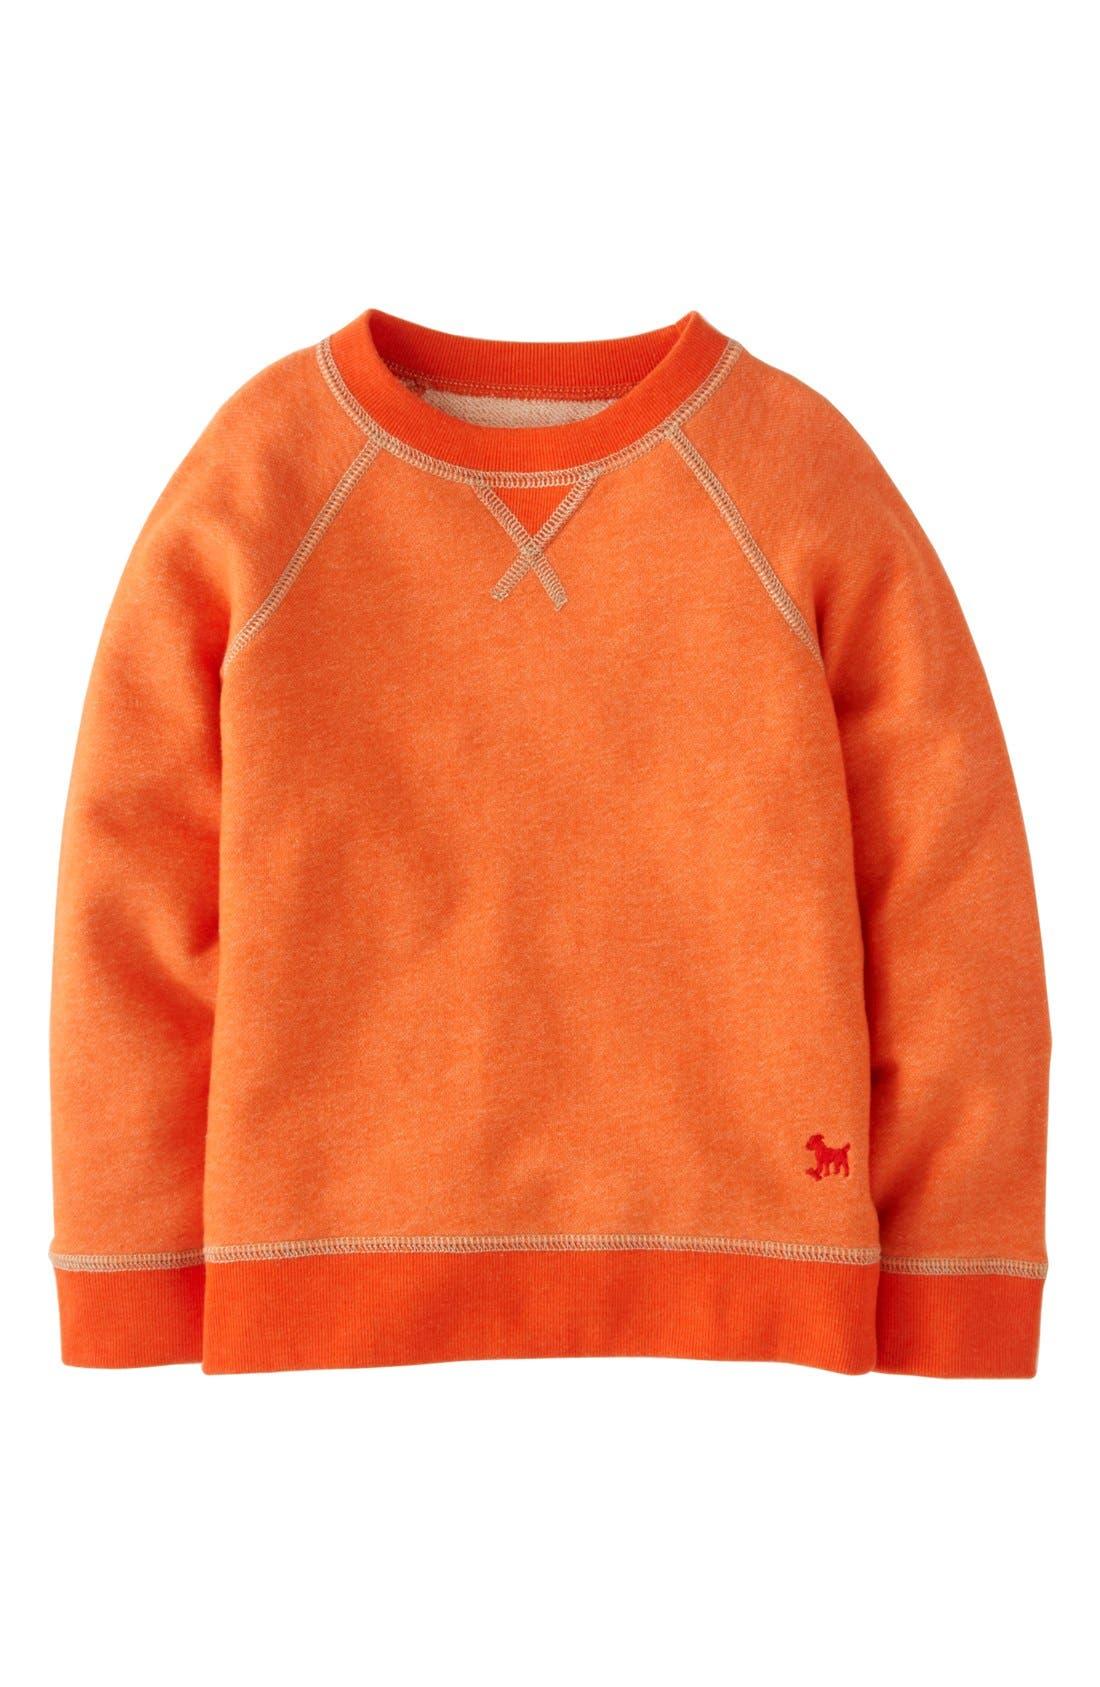 Alternate Image 1 Selected - Mini Boden Sweatshirt (Toddler Boys, Little Boys & Big Boys)